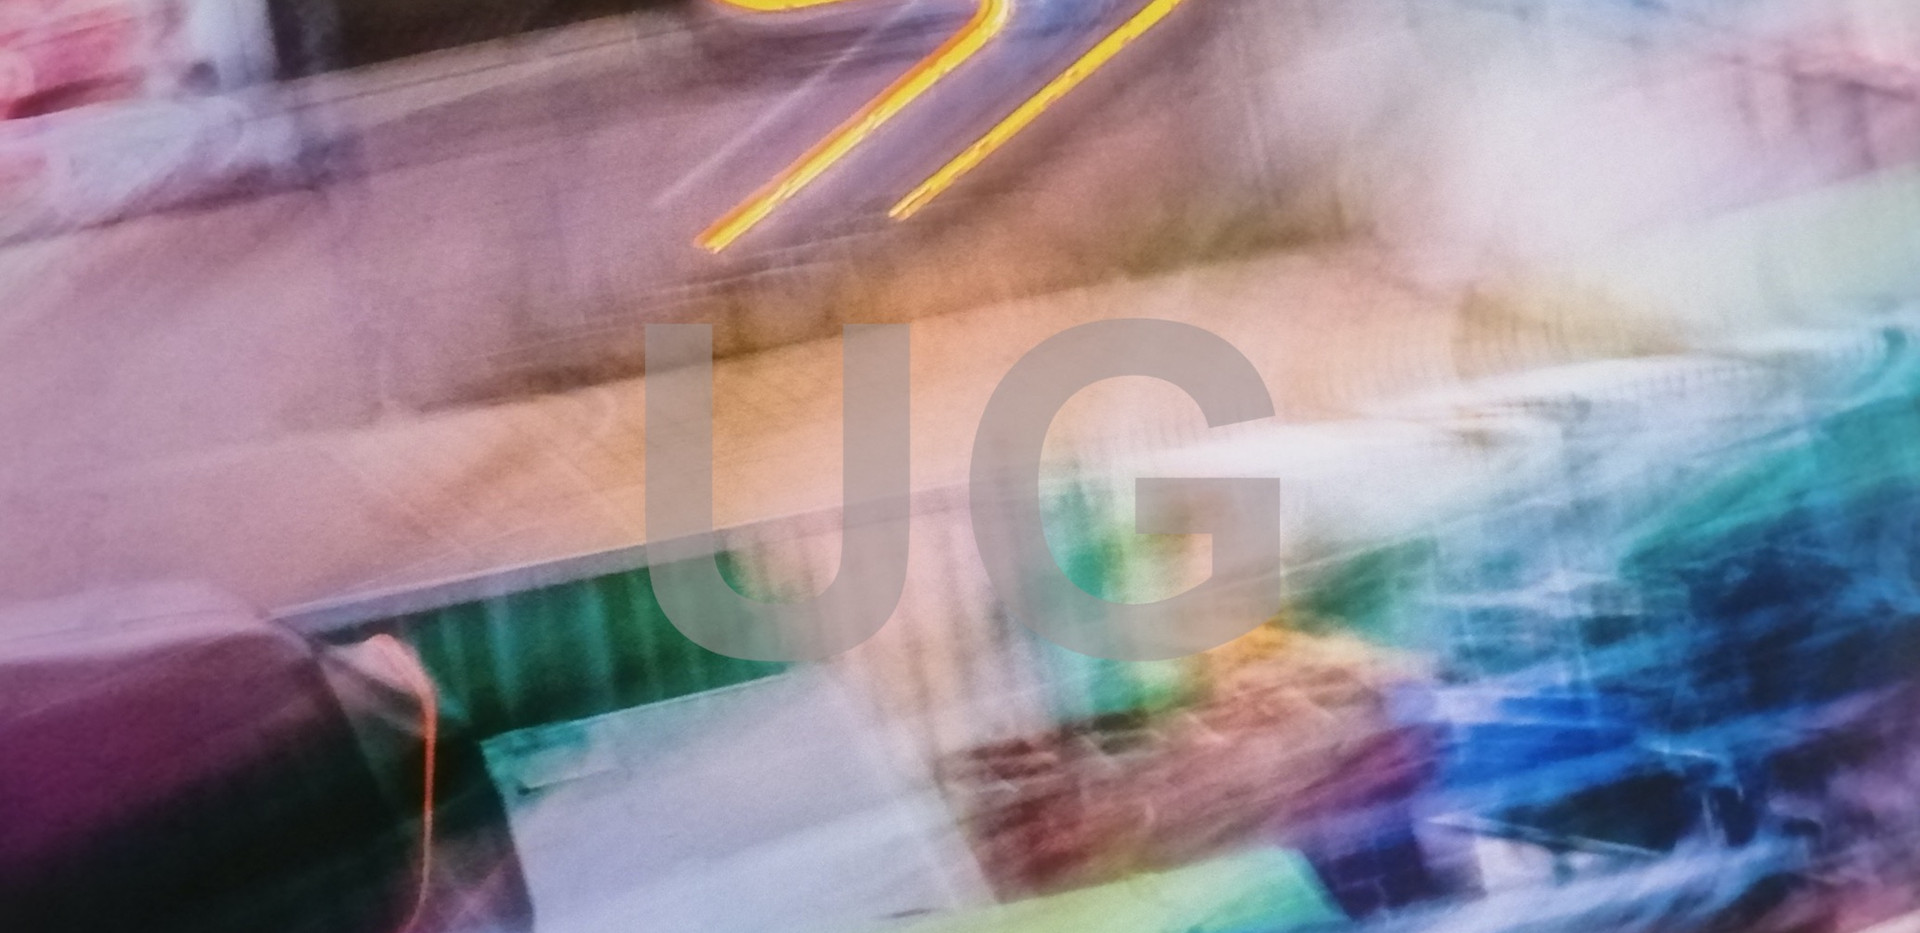 Fotografie 40x40cm | Edition 1/10 | auf